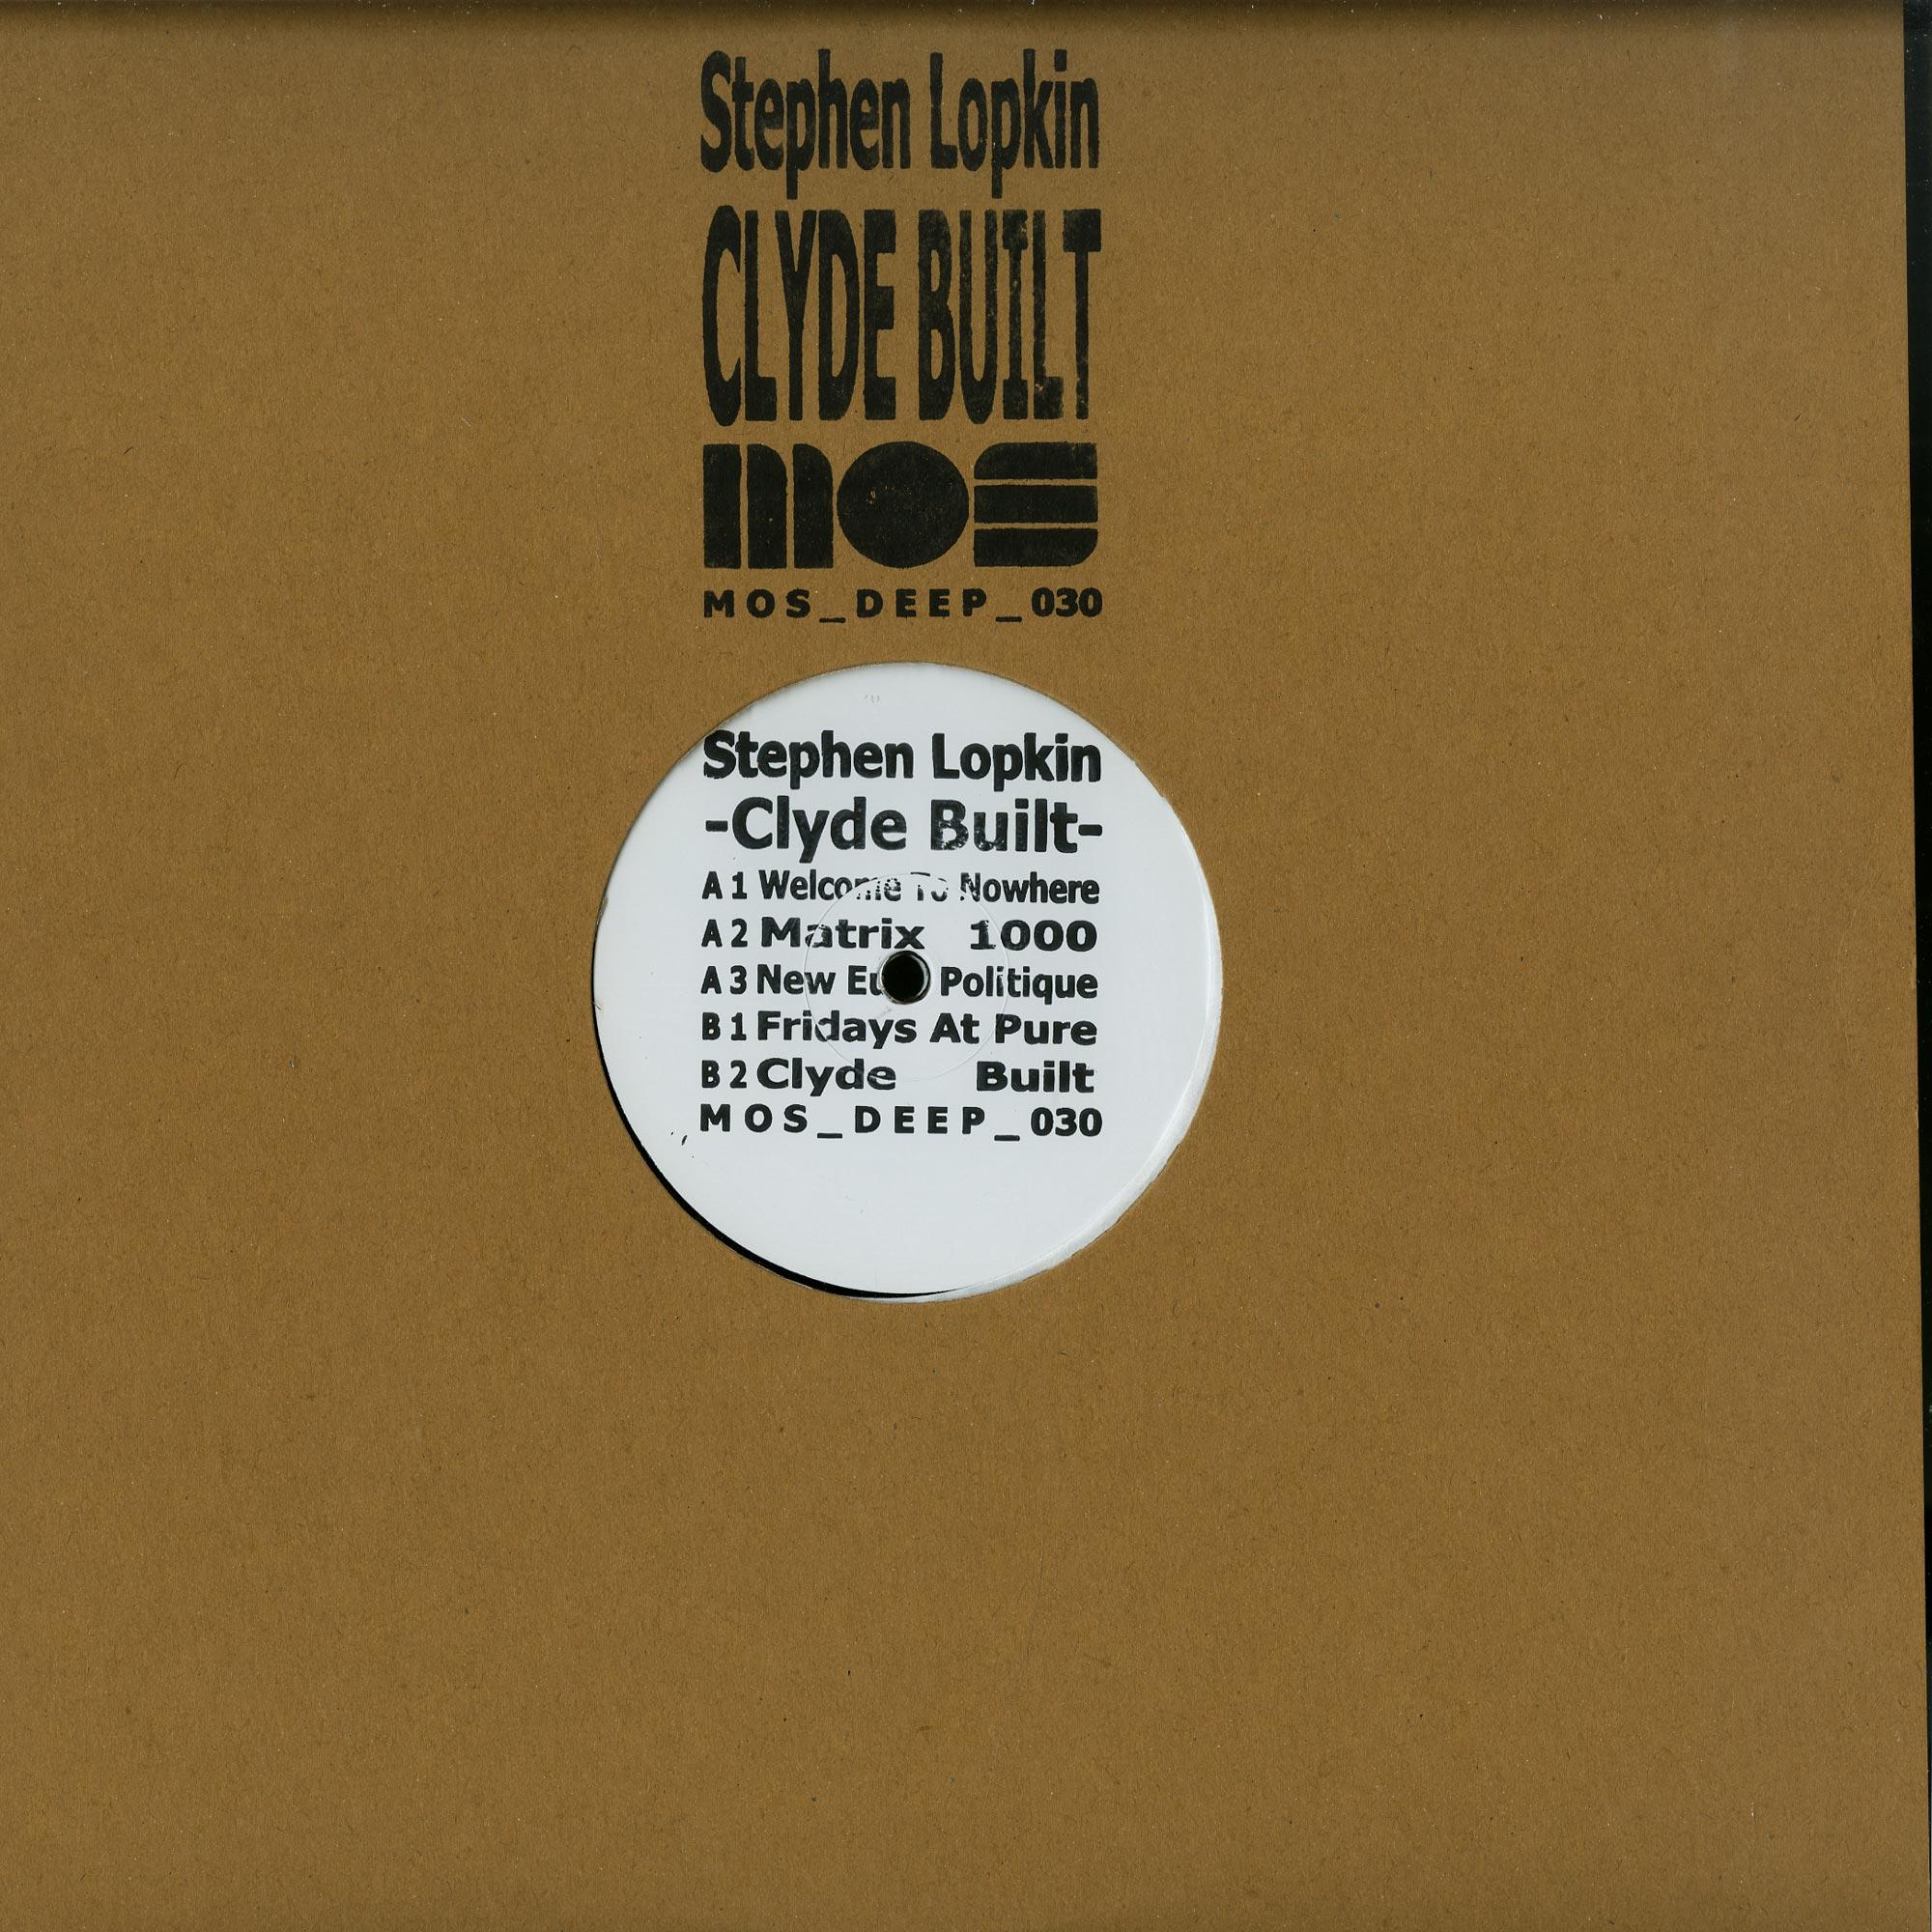 Stephen Lopkin - CLYDE BUILT